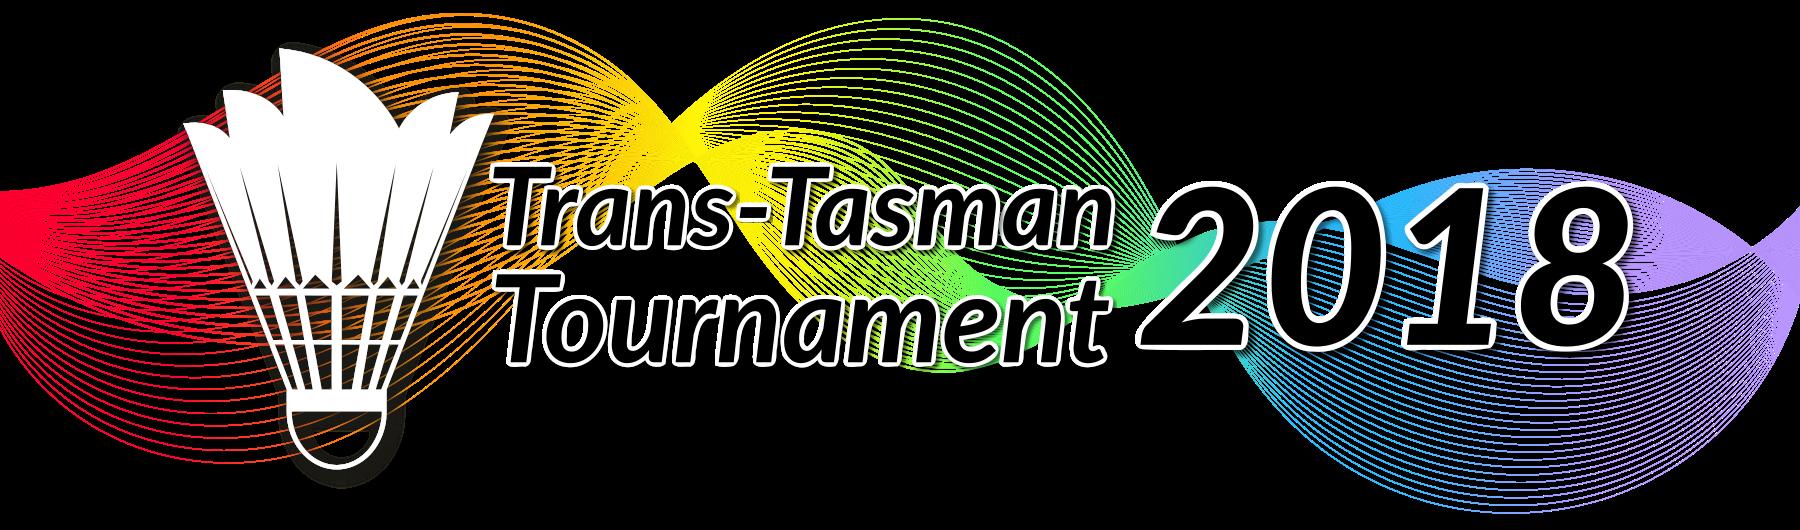 Trans-Tasman Tournament 2018